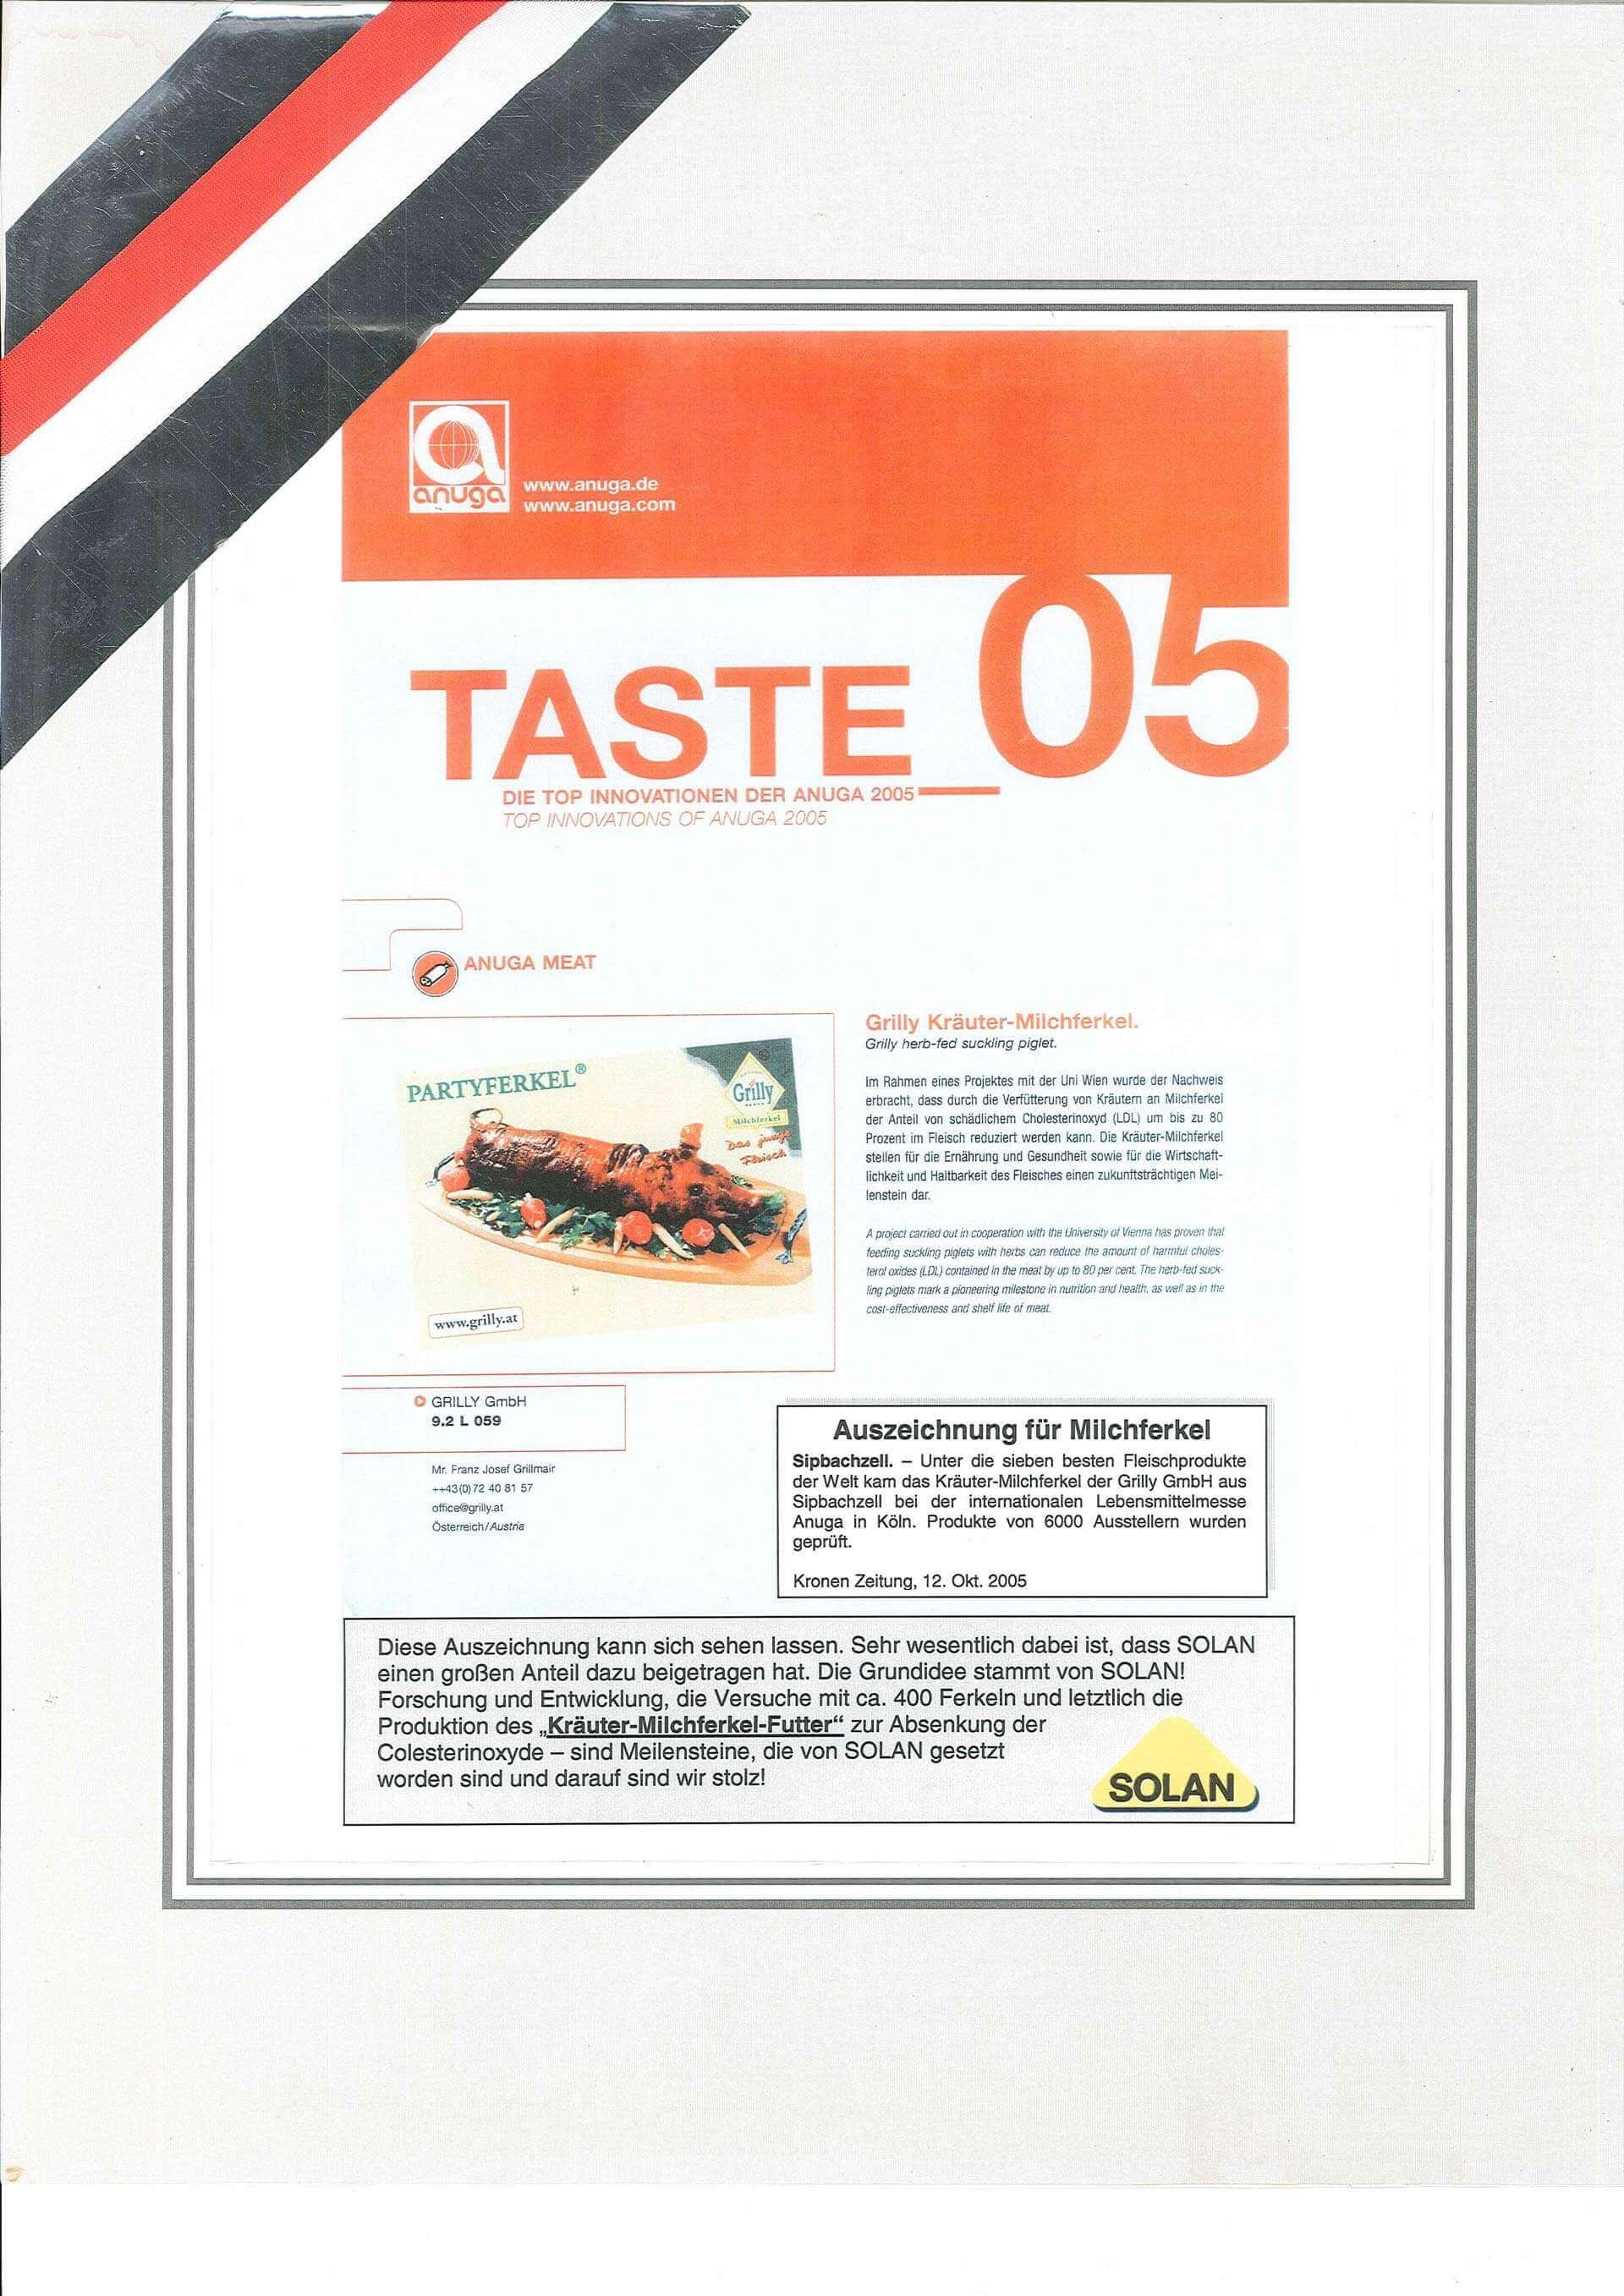 taste0501 - Grilly GmbH